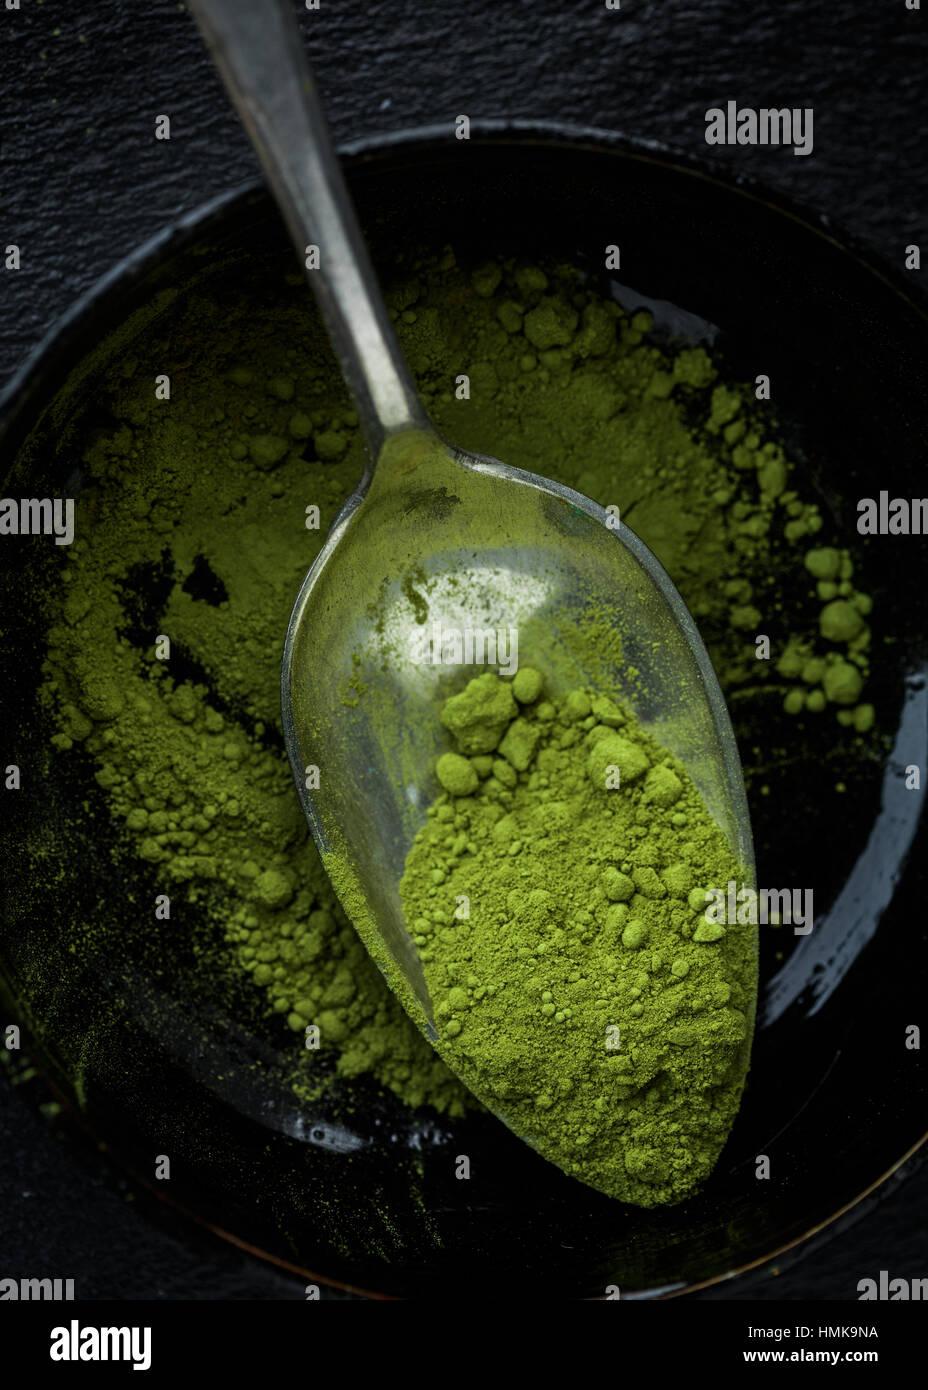 Directly above shot of matcha tea powder on spoon Stock Photo